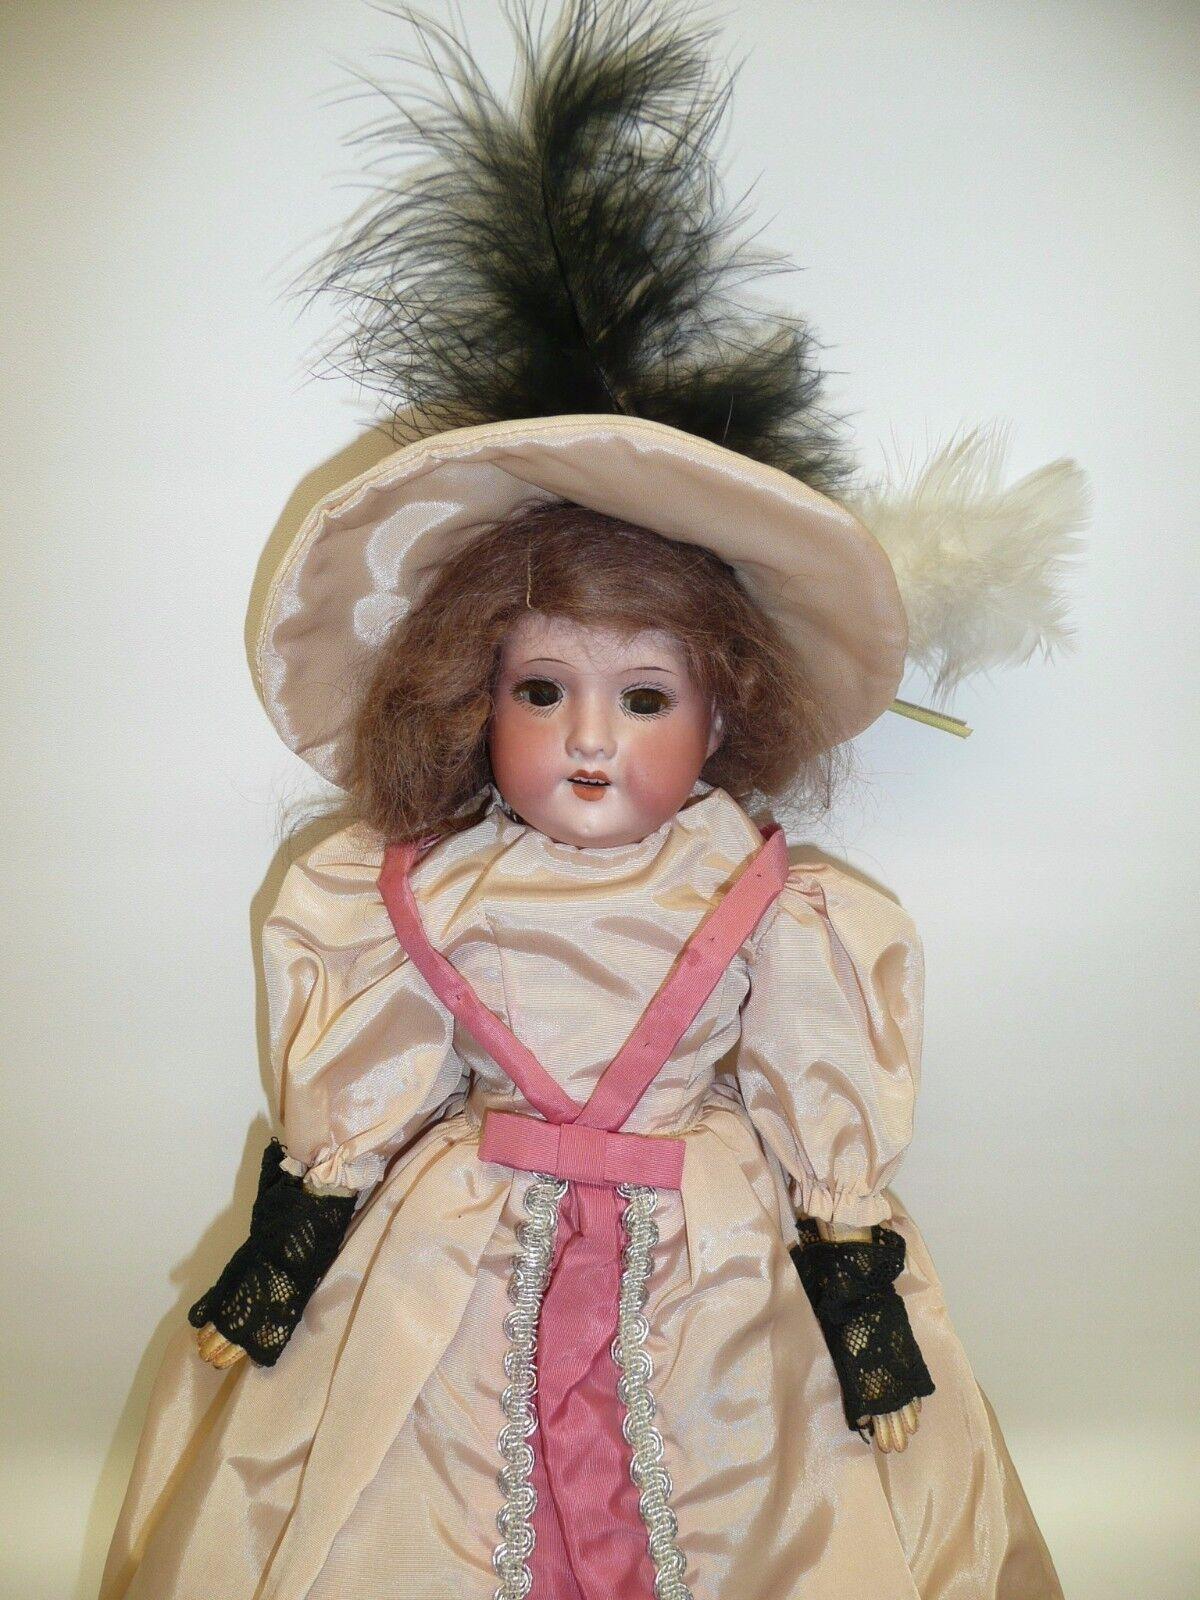 15  Antique AM 370 6 Geruomo bambola w Marronee  Sleep Eyes  nelle promozioni dello stadio